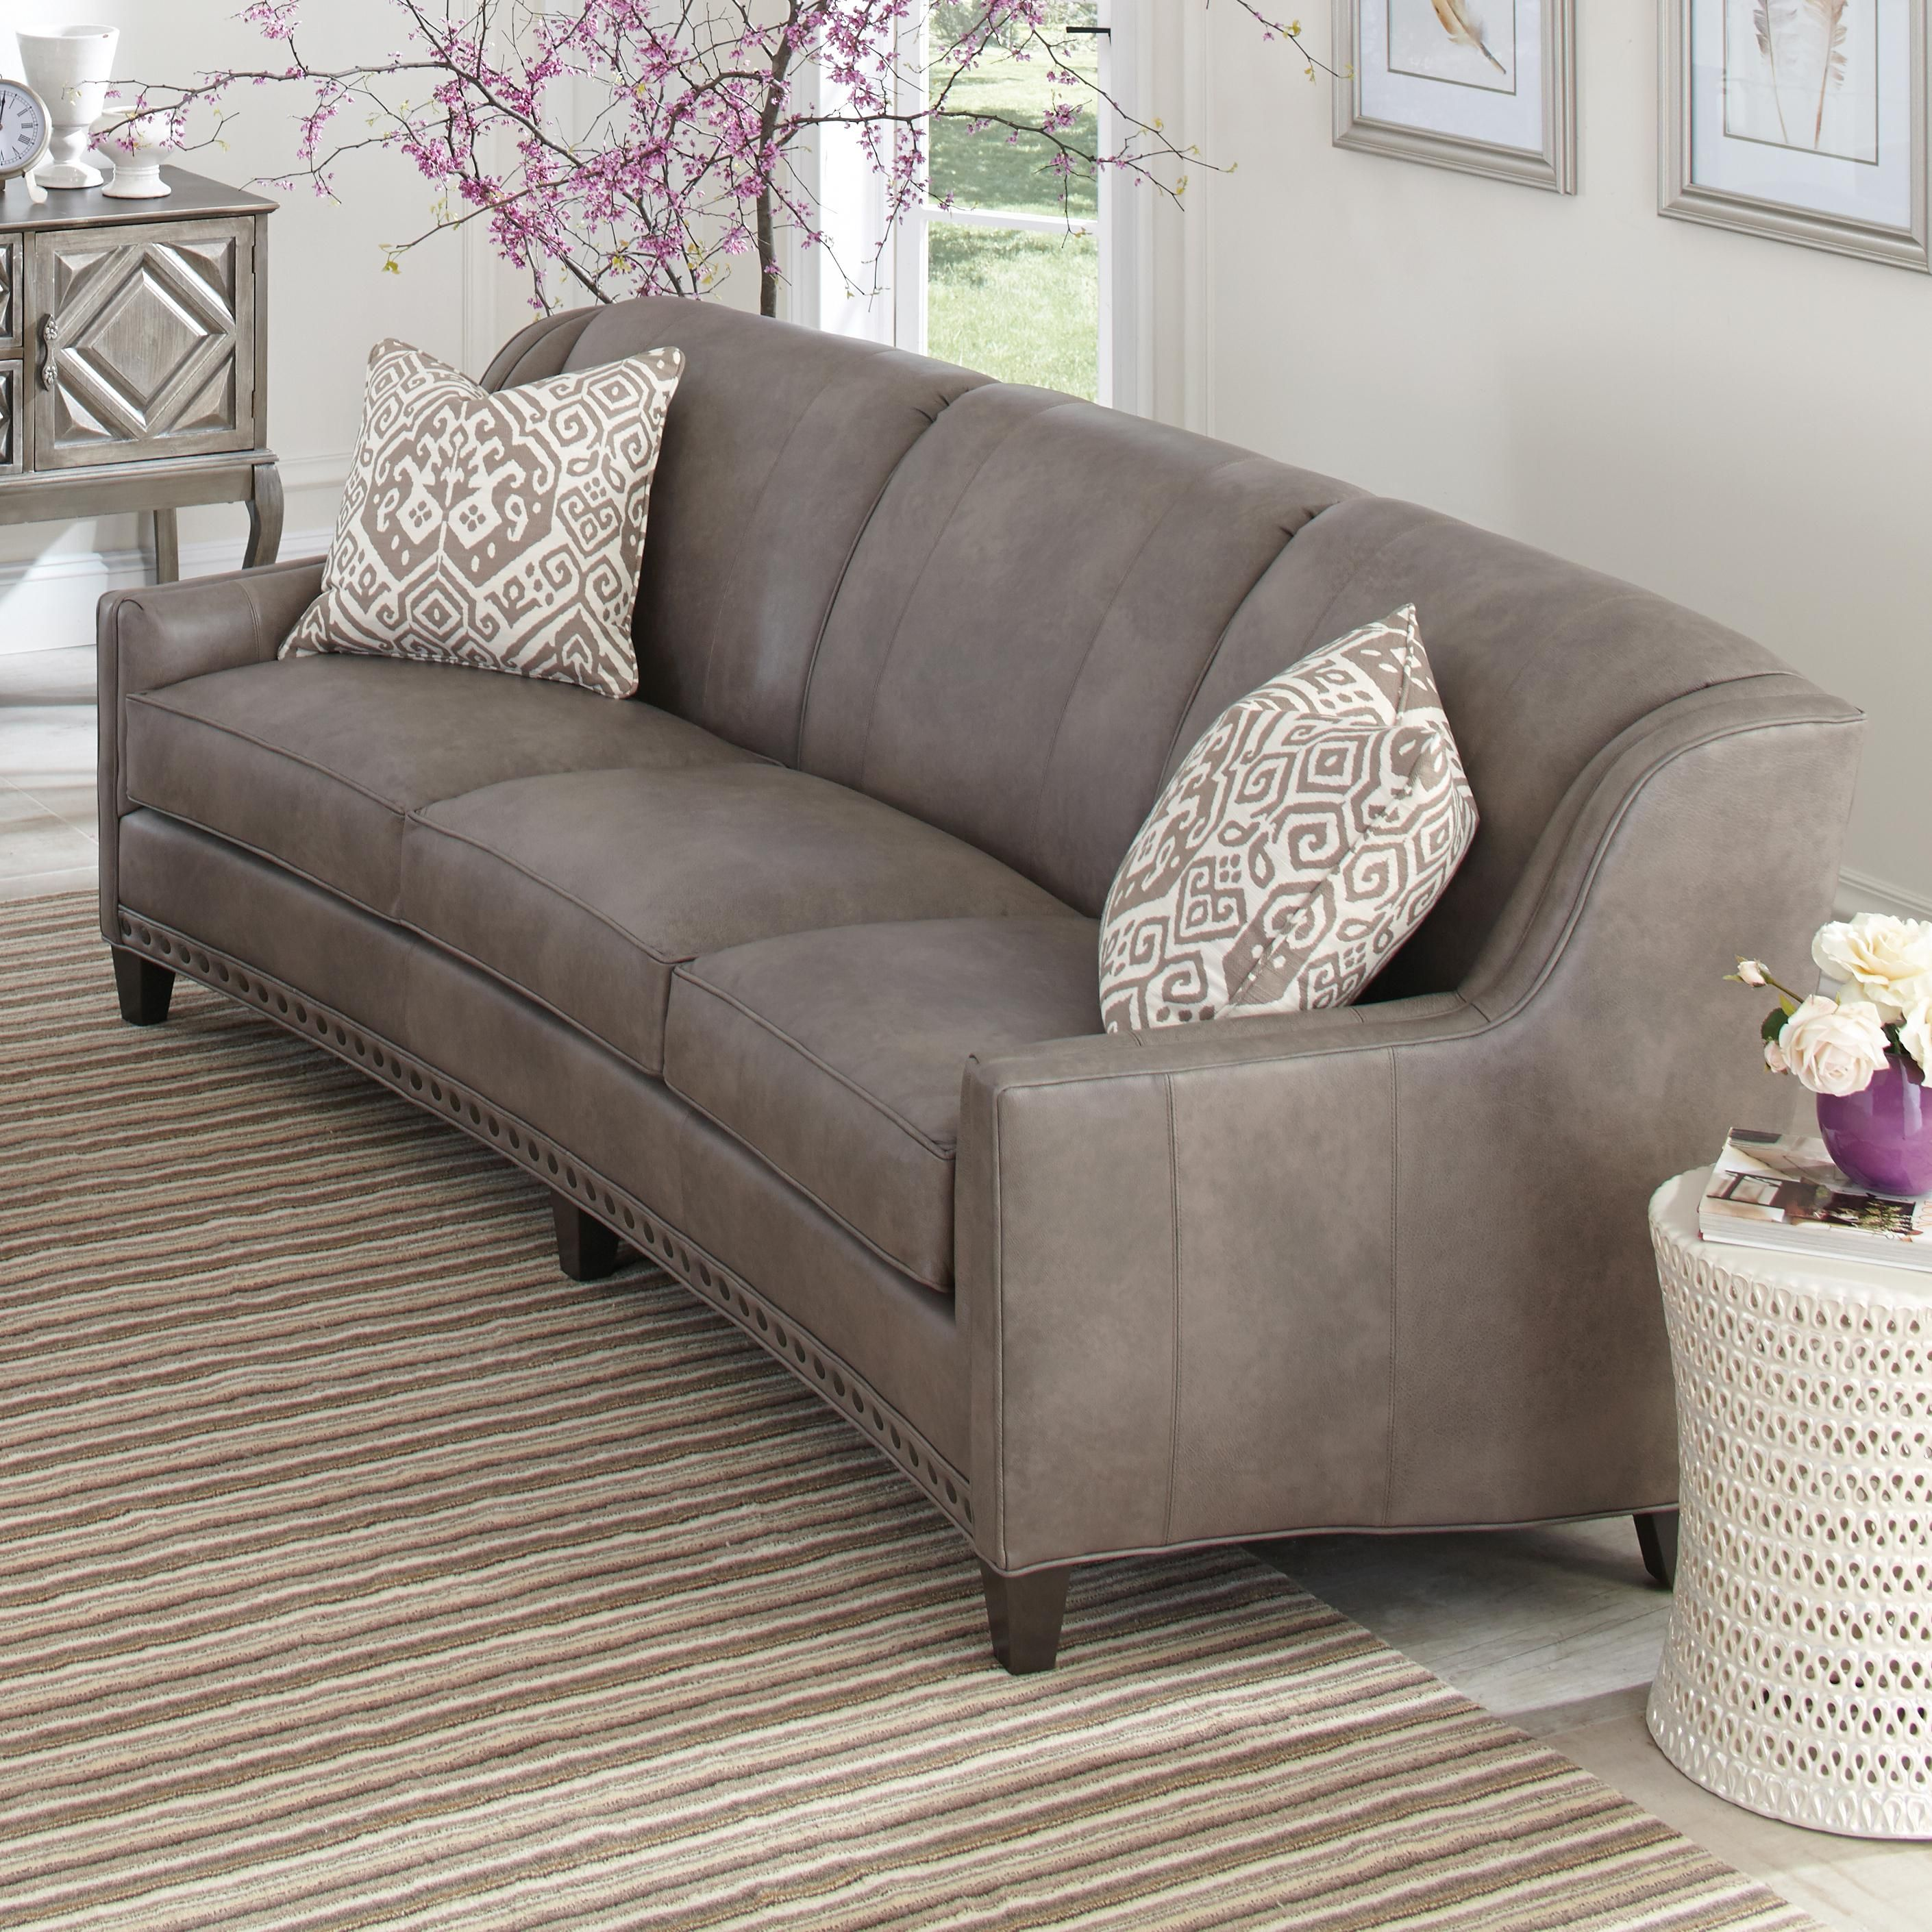 227 Stationary Sofa By Peter Lorentz